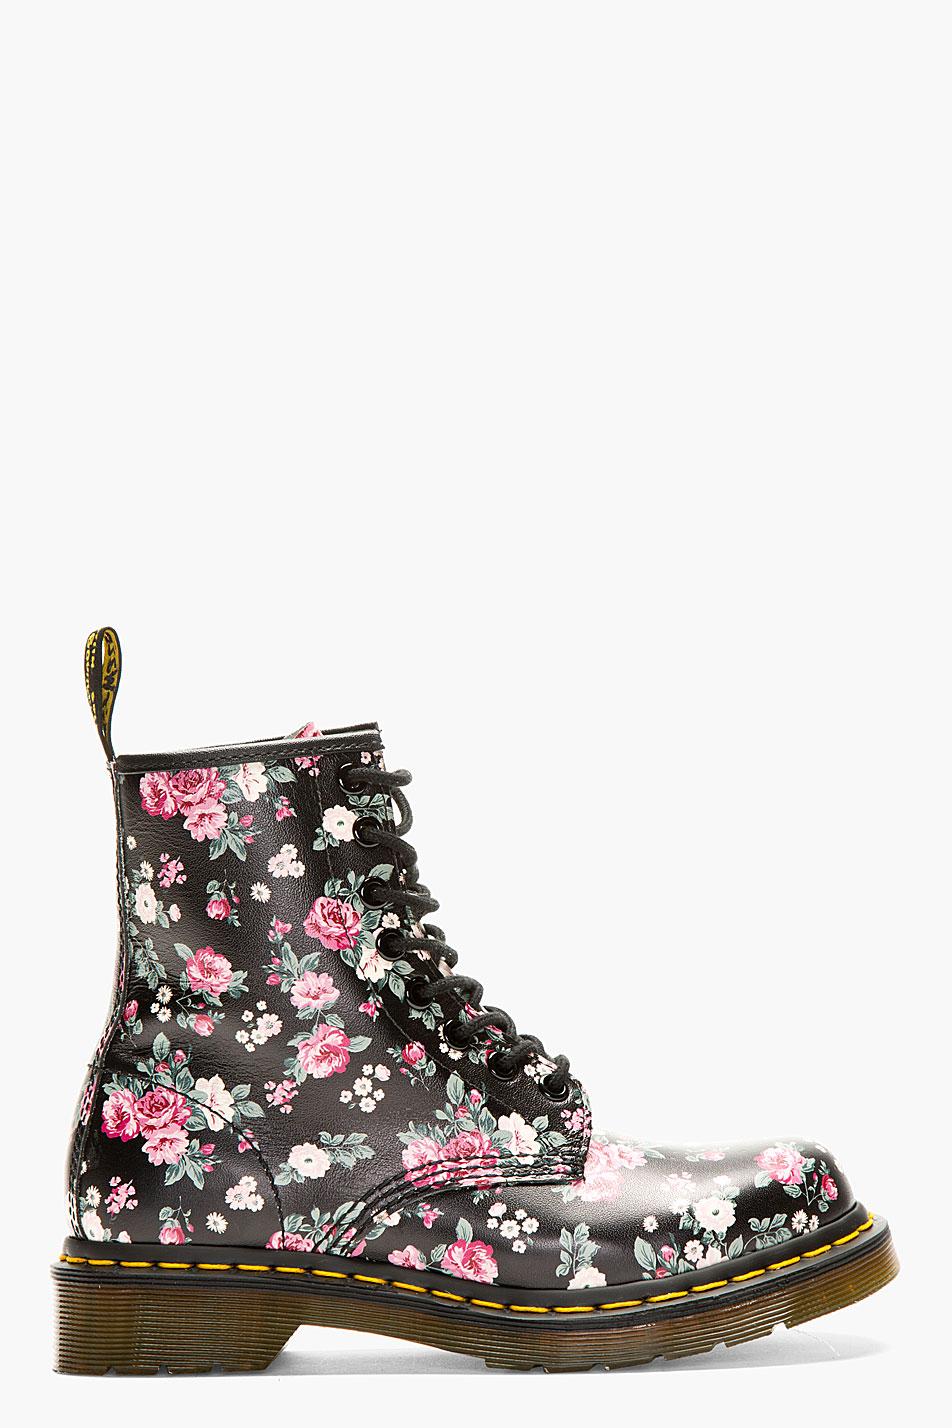 Dr Martens Black Floral Print 8 Eye Ankle Boots Lyst